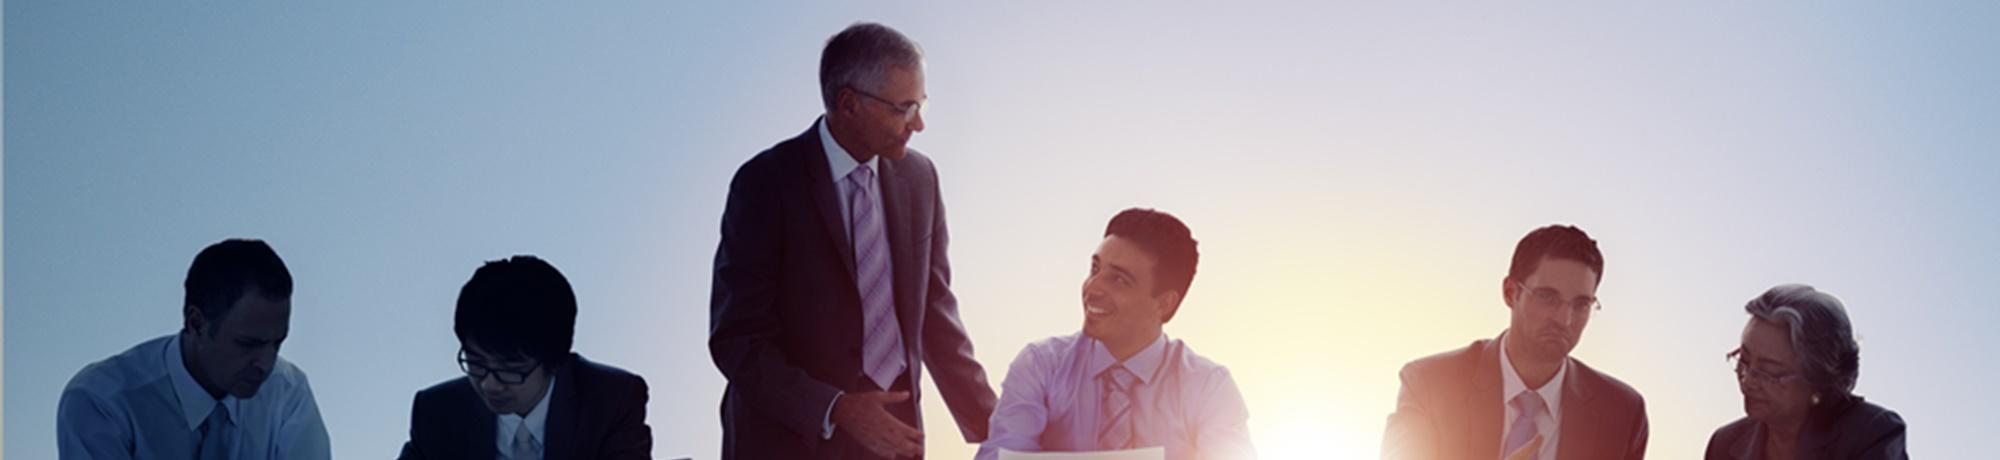 coaching-empresarial-saiba-mais